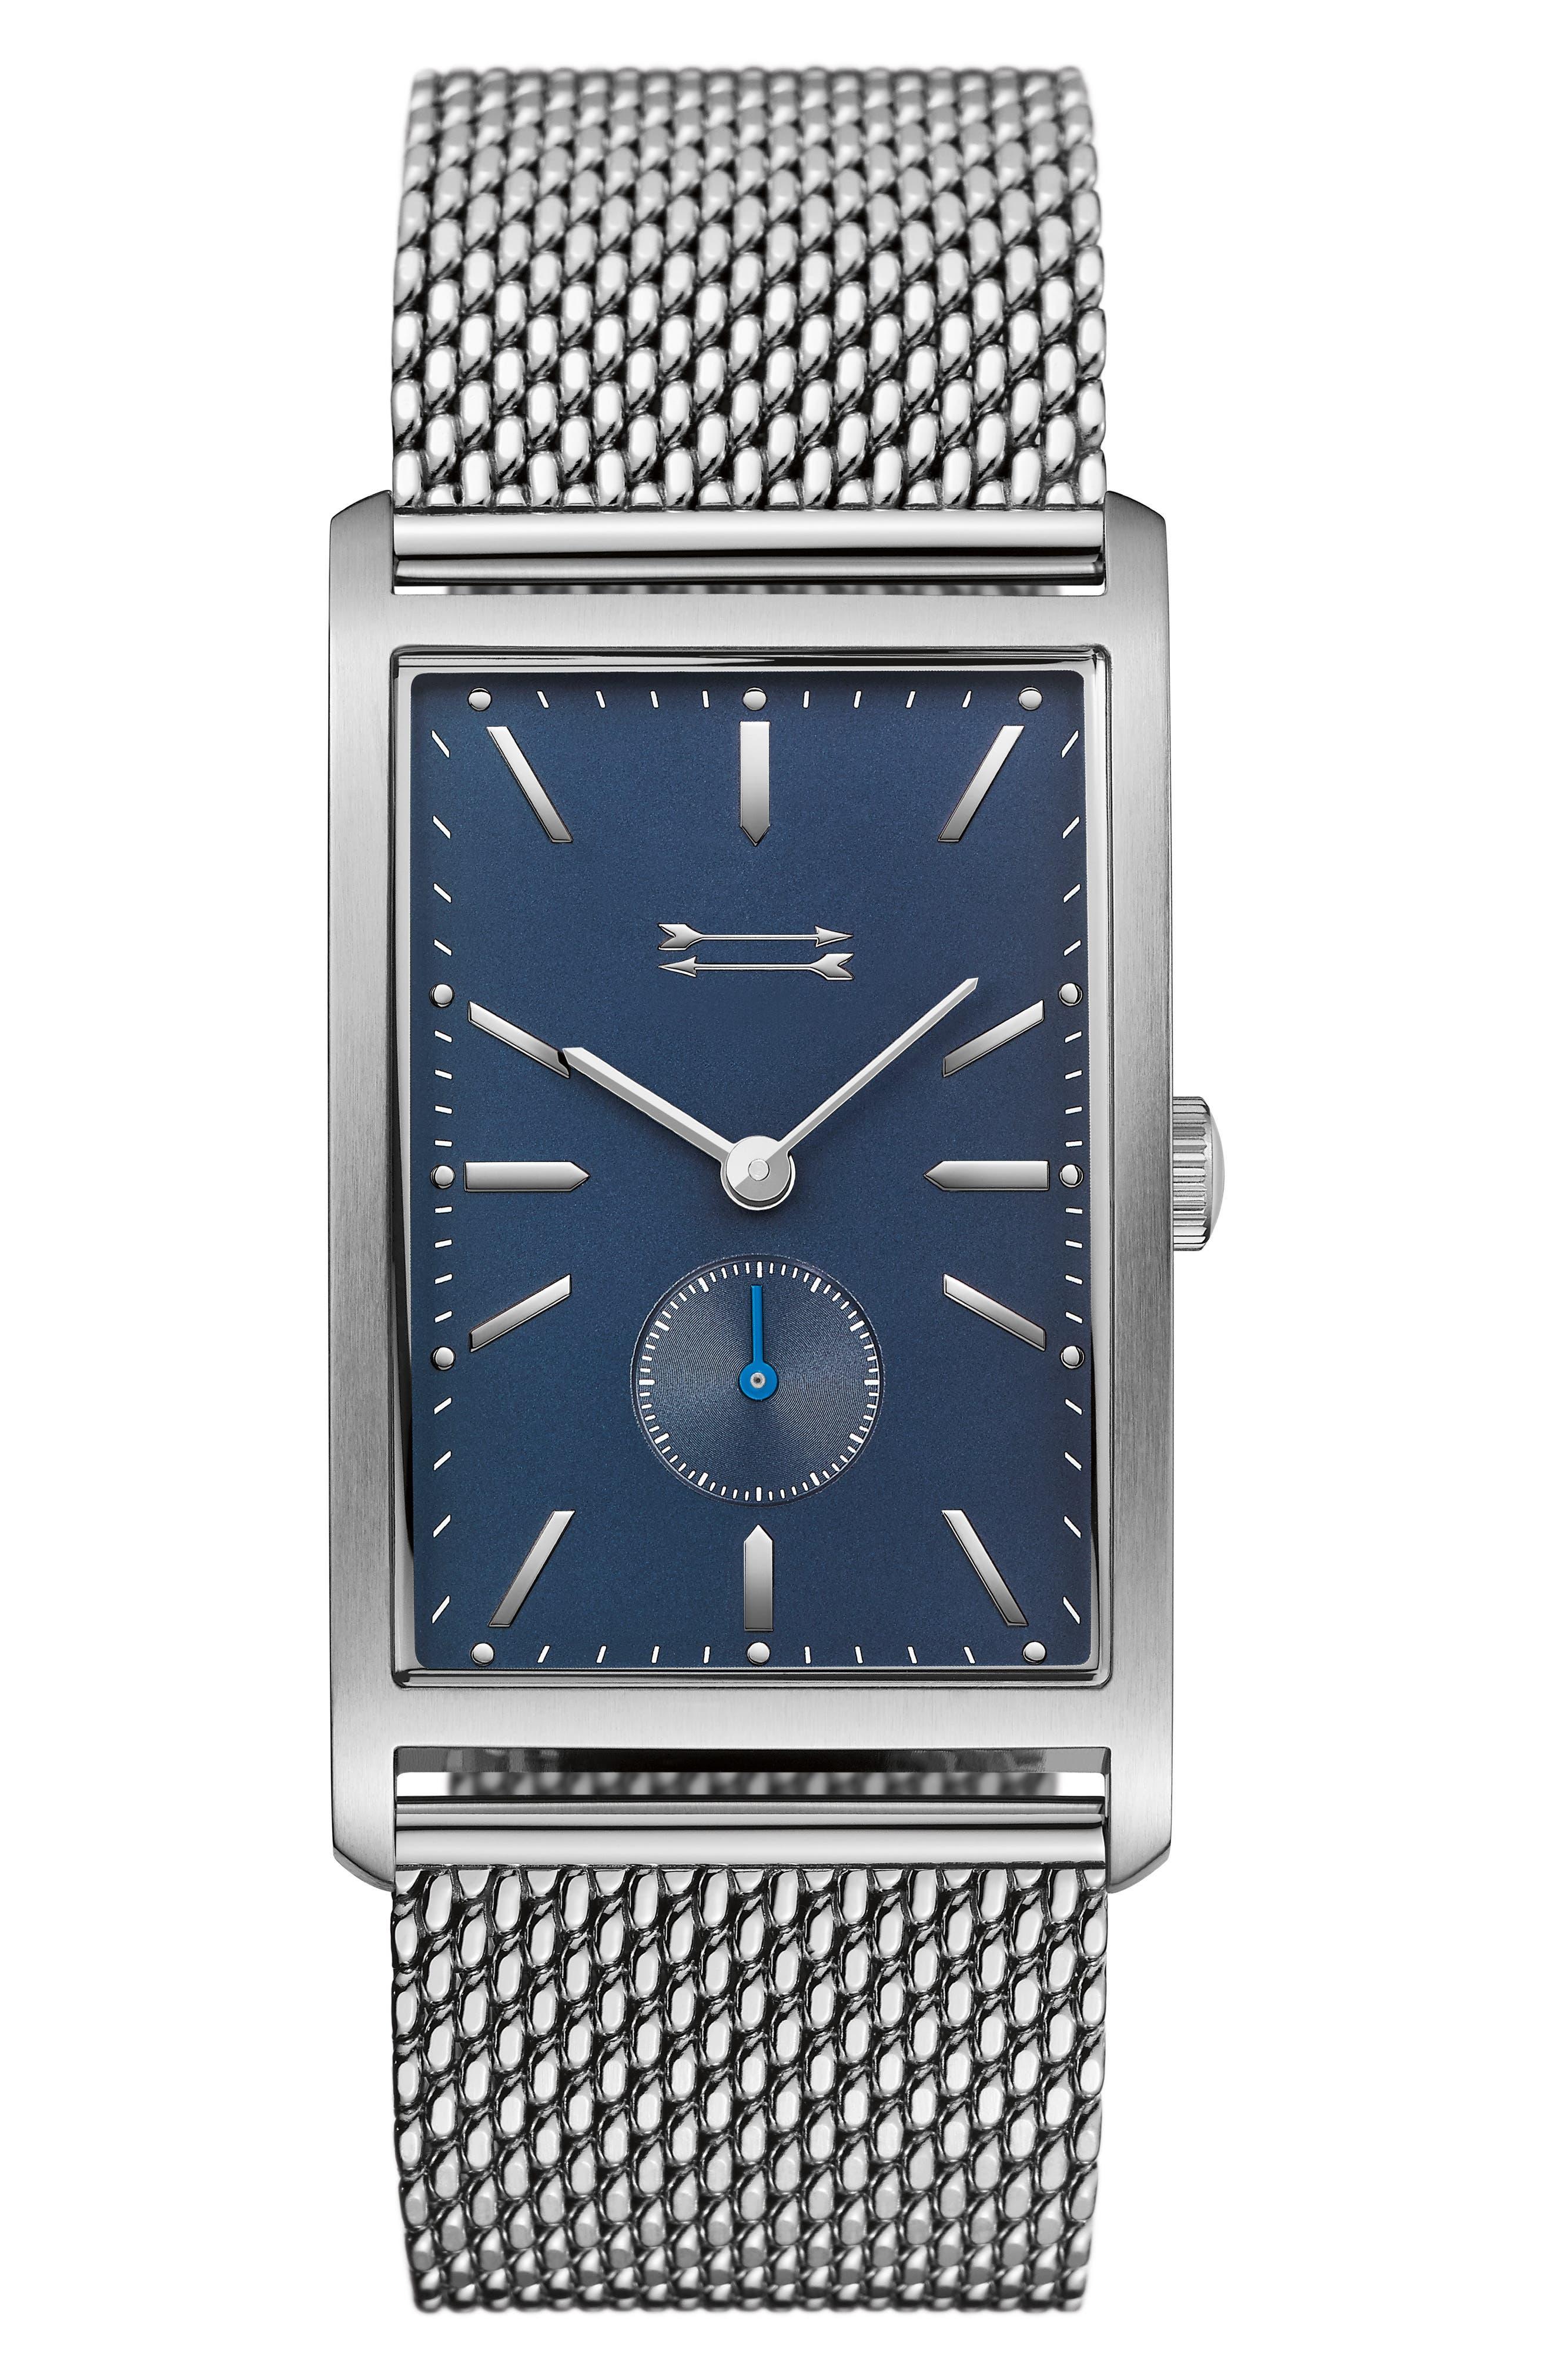 URI MINKOFF Pesaro Mesh Strap Watch, 27mm